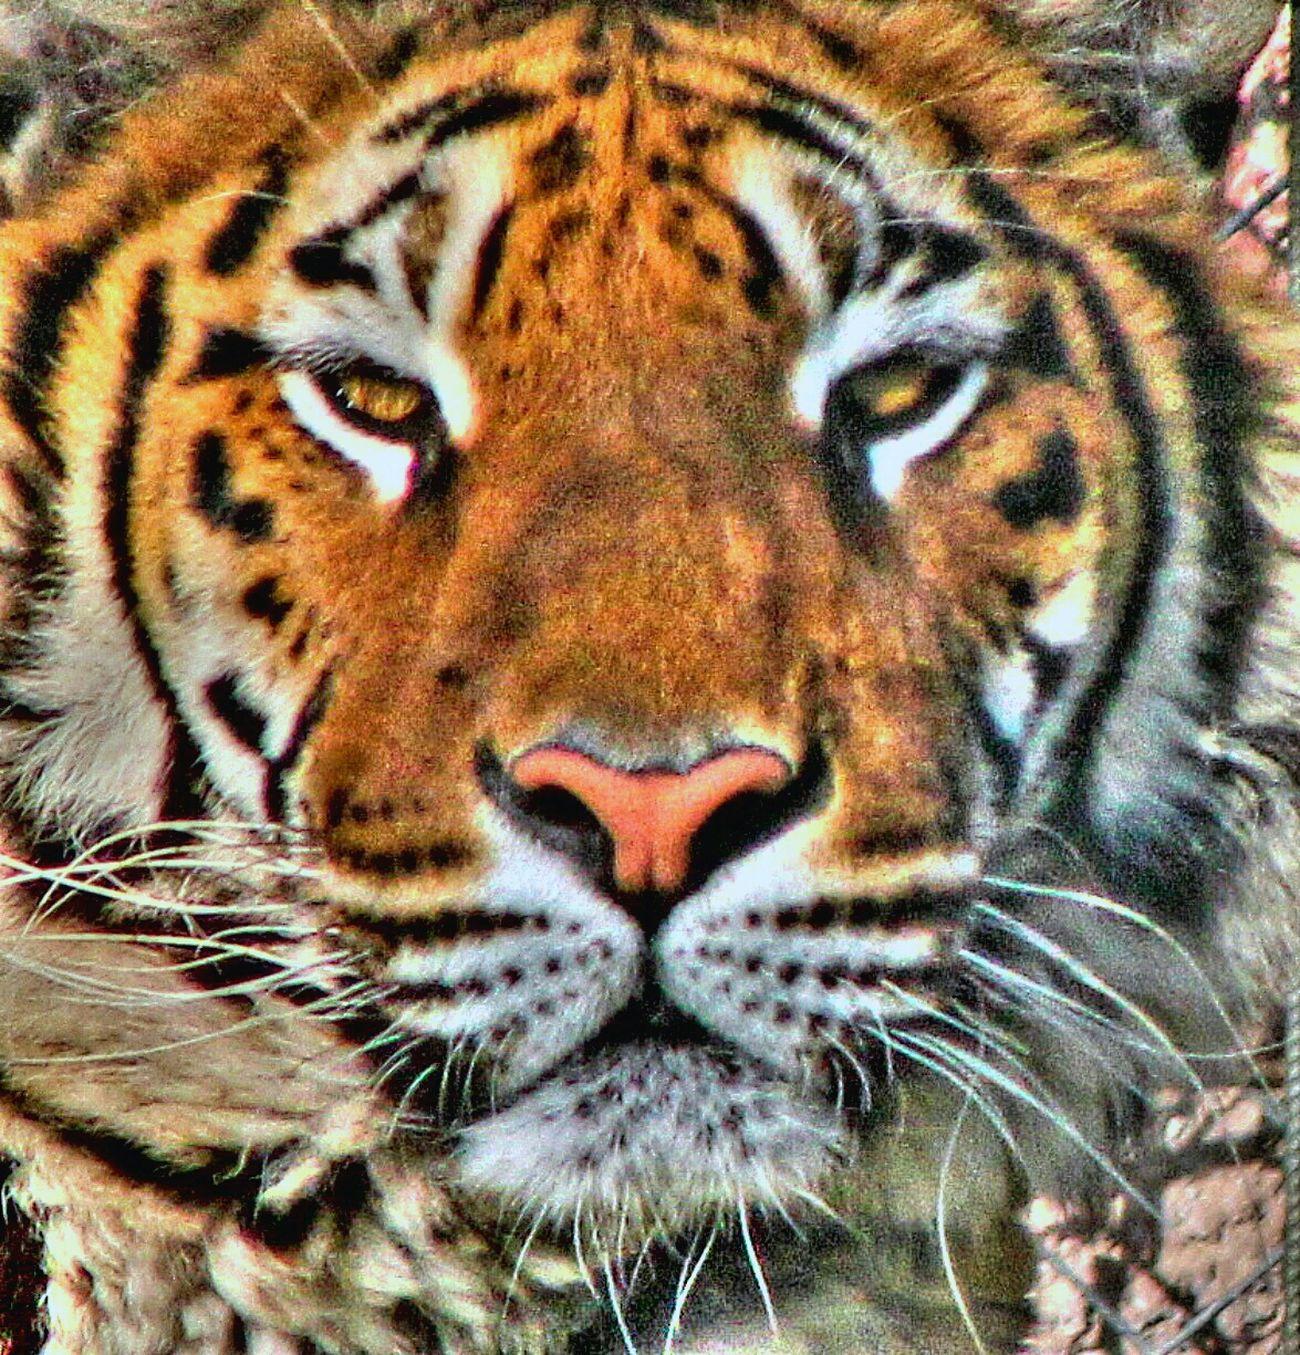 EyeEm Best Shots tiger Nature_collection animals Wildlife Photography Portrait EyeEmBestPics